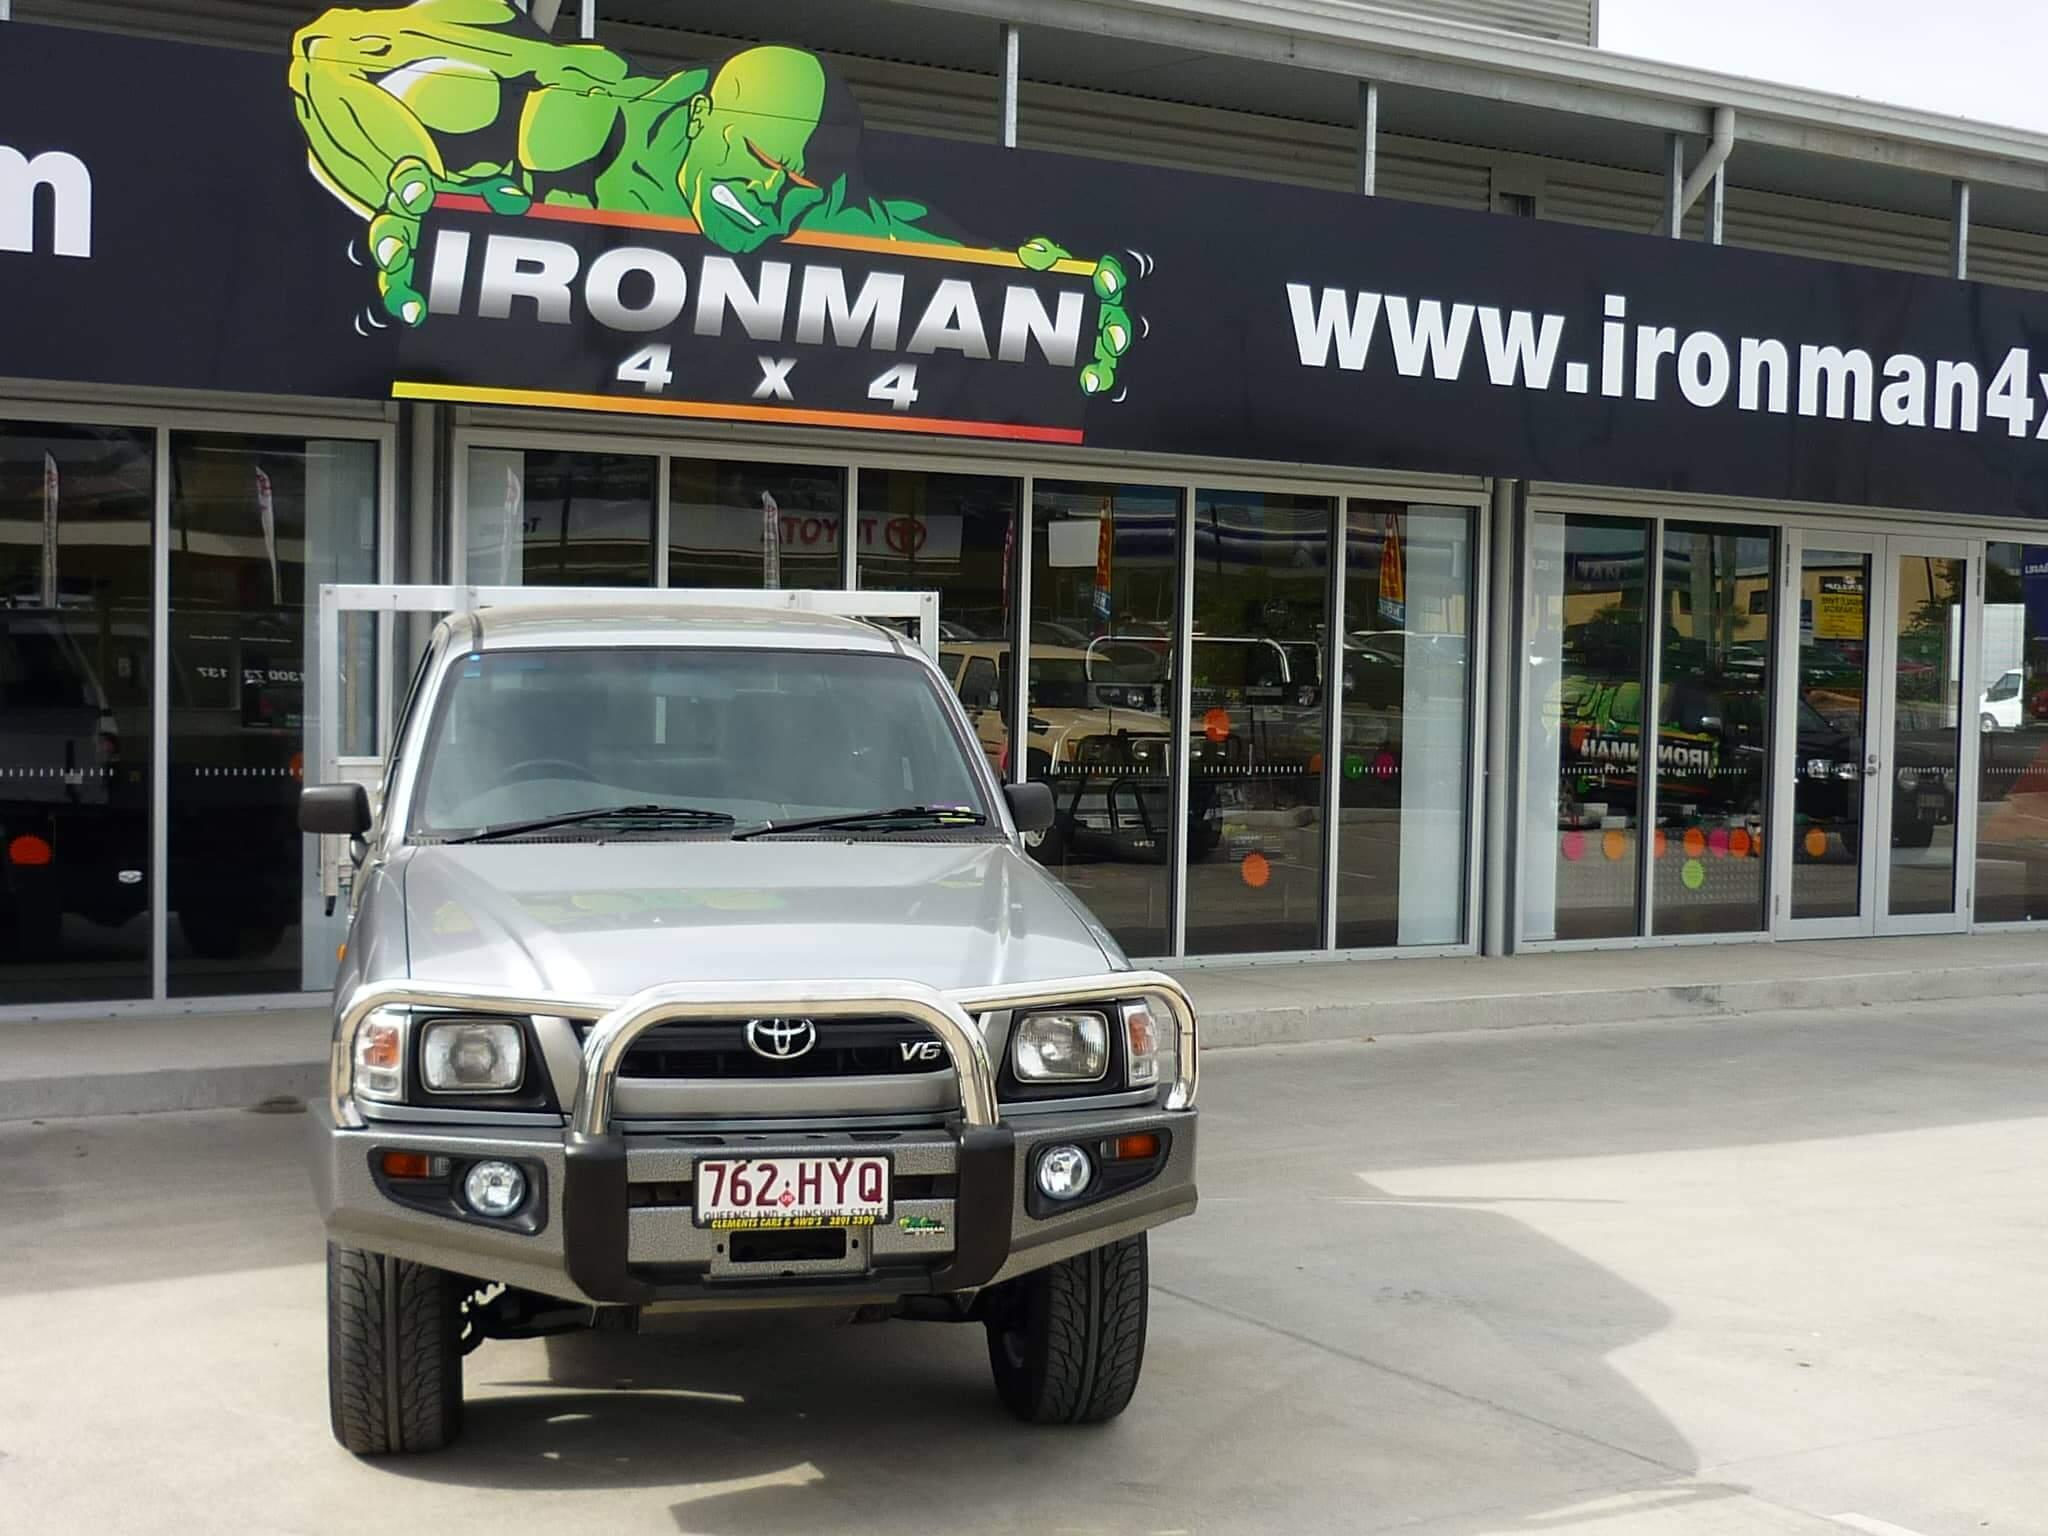 https://www.mnf4x4.com.au/media/Ironman-4x4-Protector-Hilux-1997-2004-1.jpg